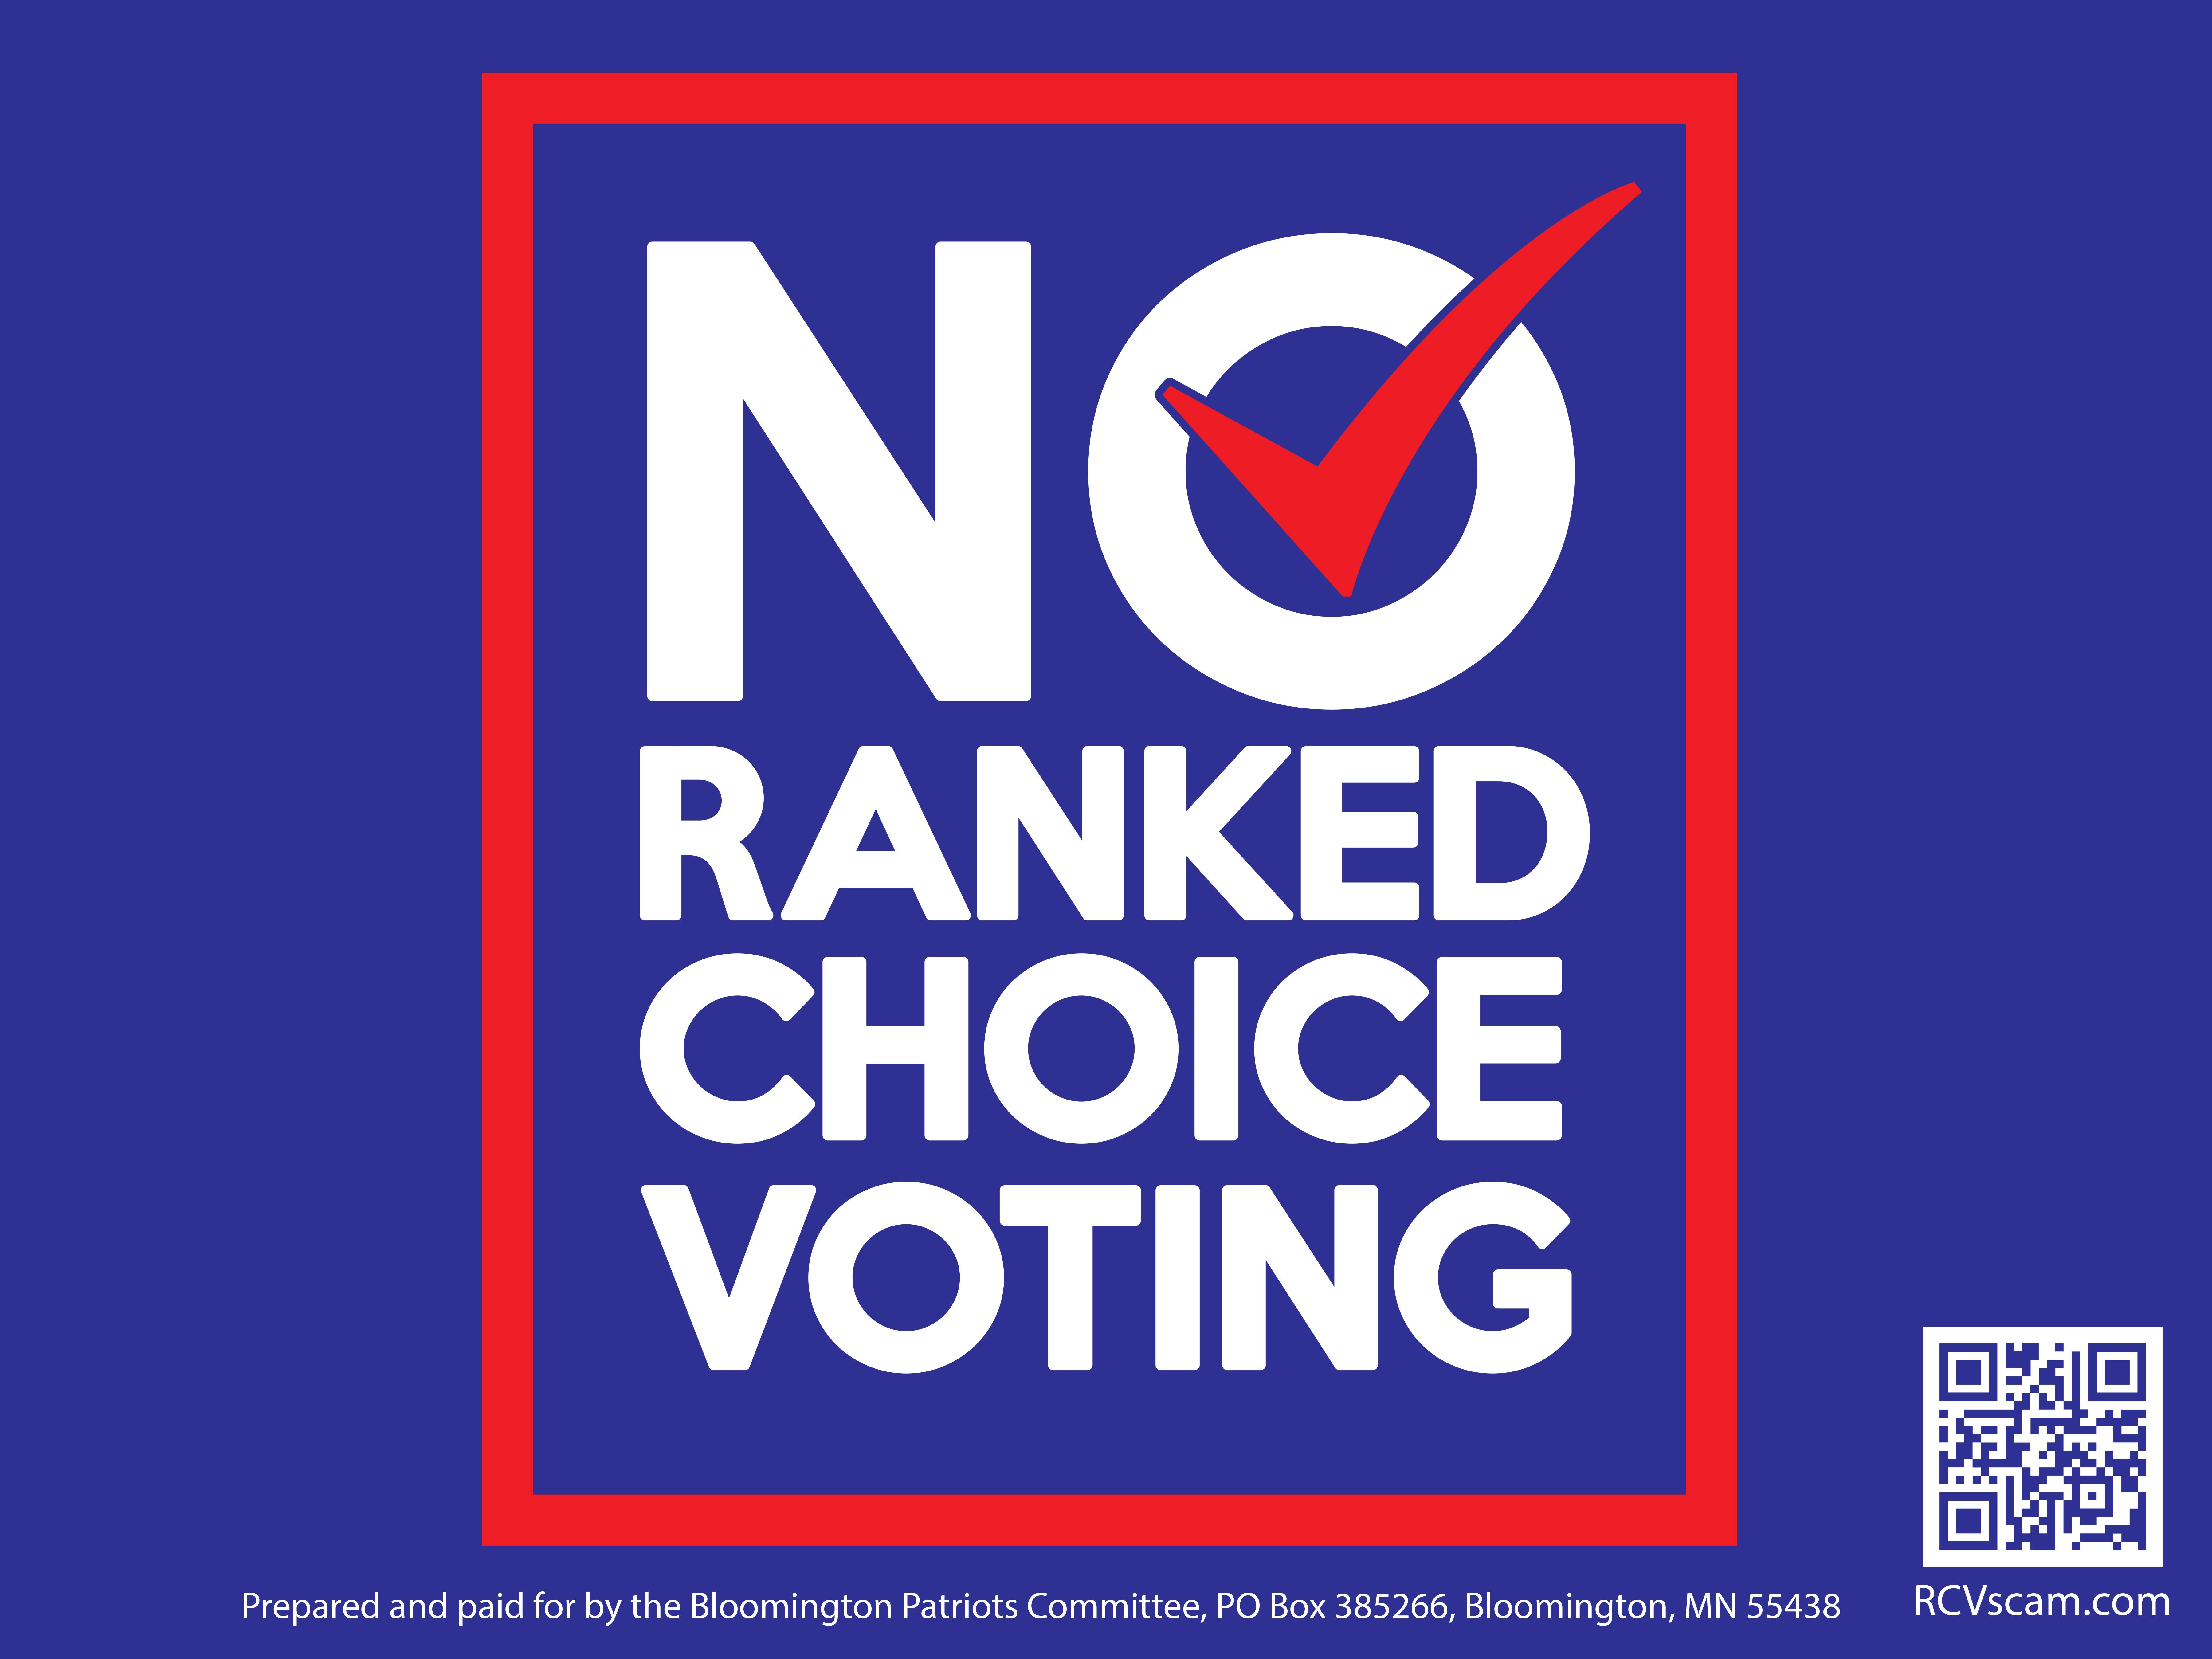 Logo_No_Ranked_Choice_Voting.jpg